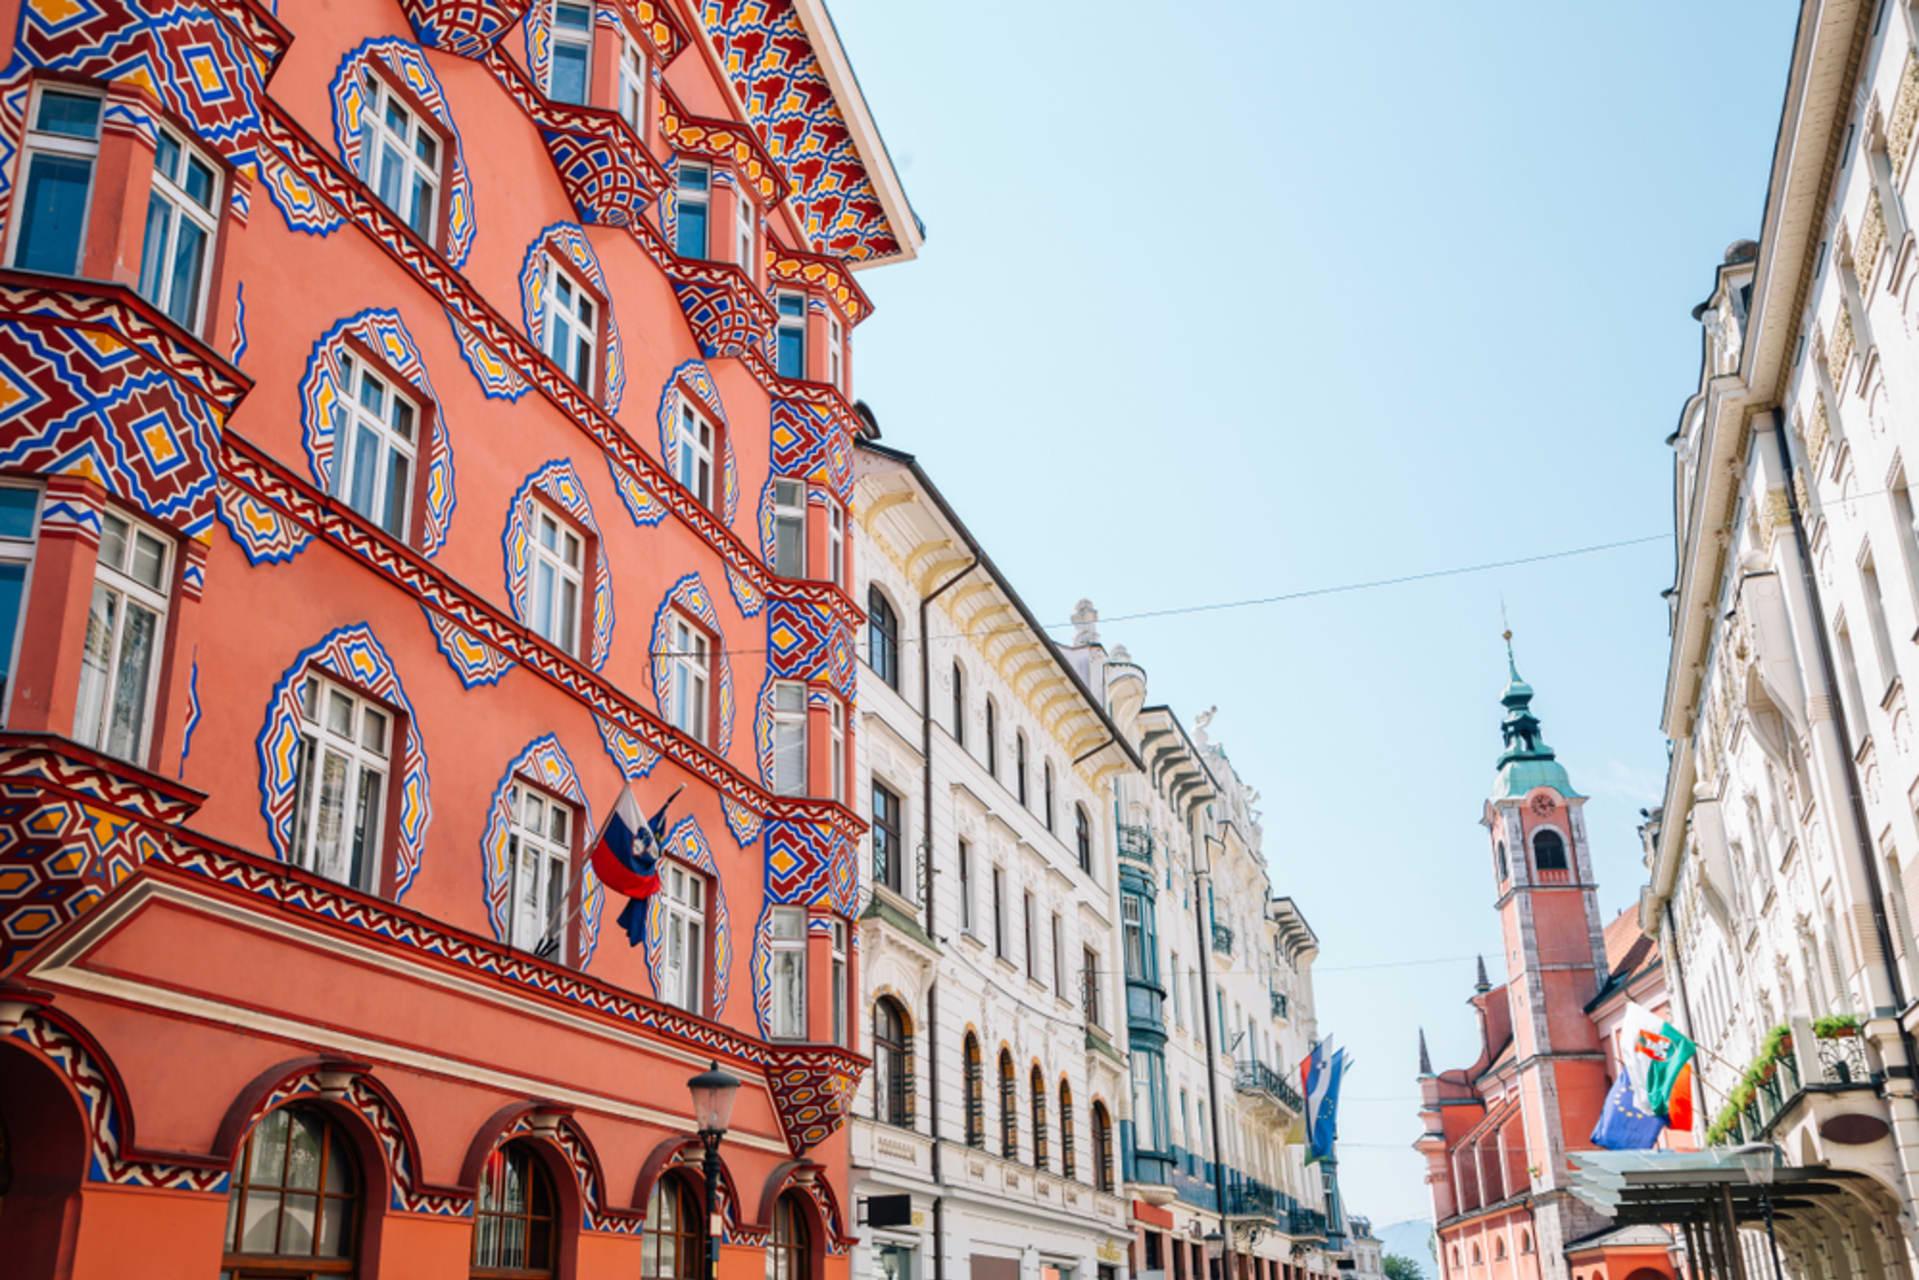 Ljubljana - Centuries of Art in One City